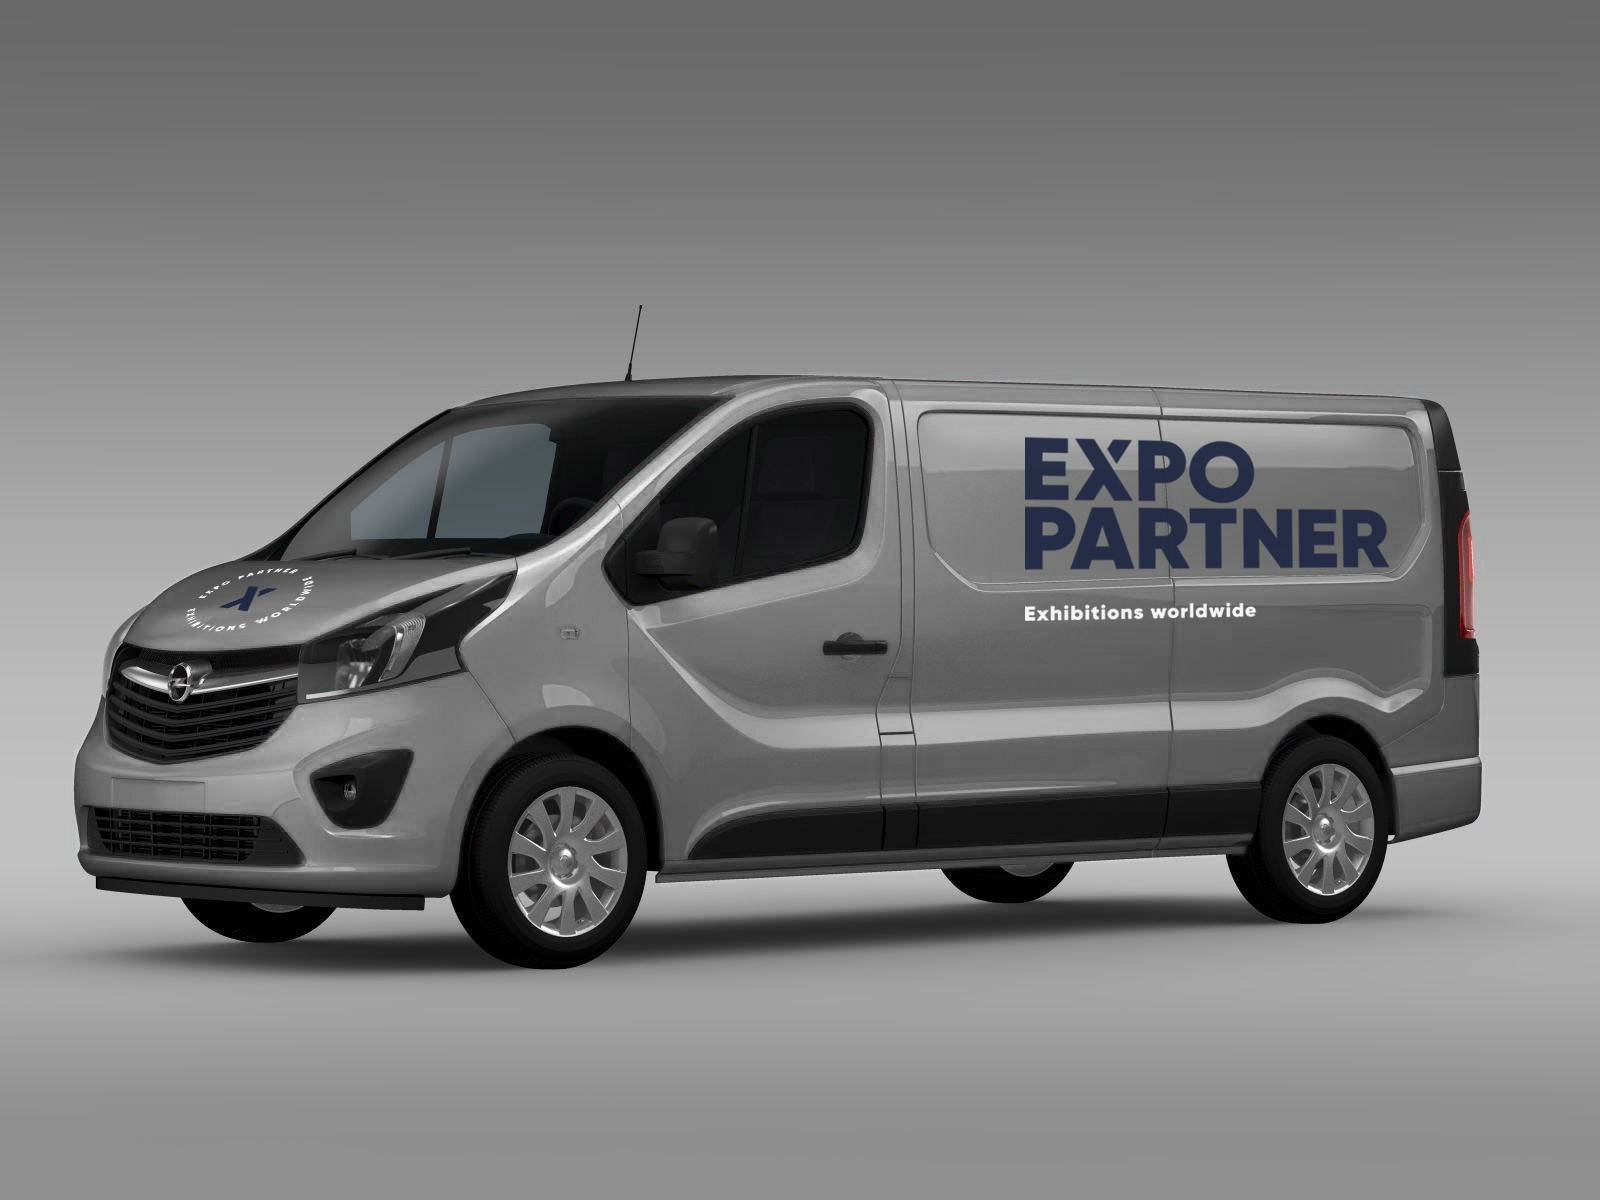 Expo Partner logo på bil